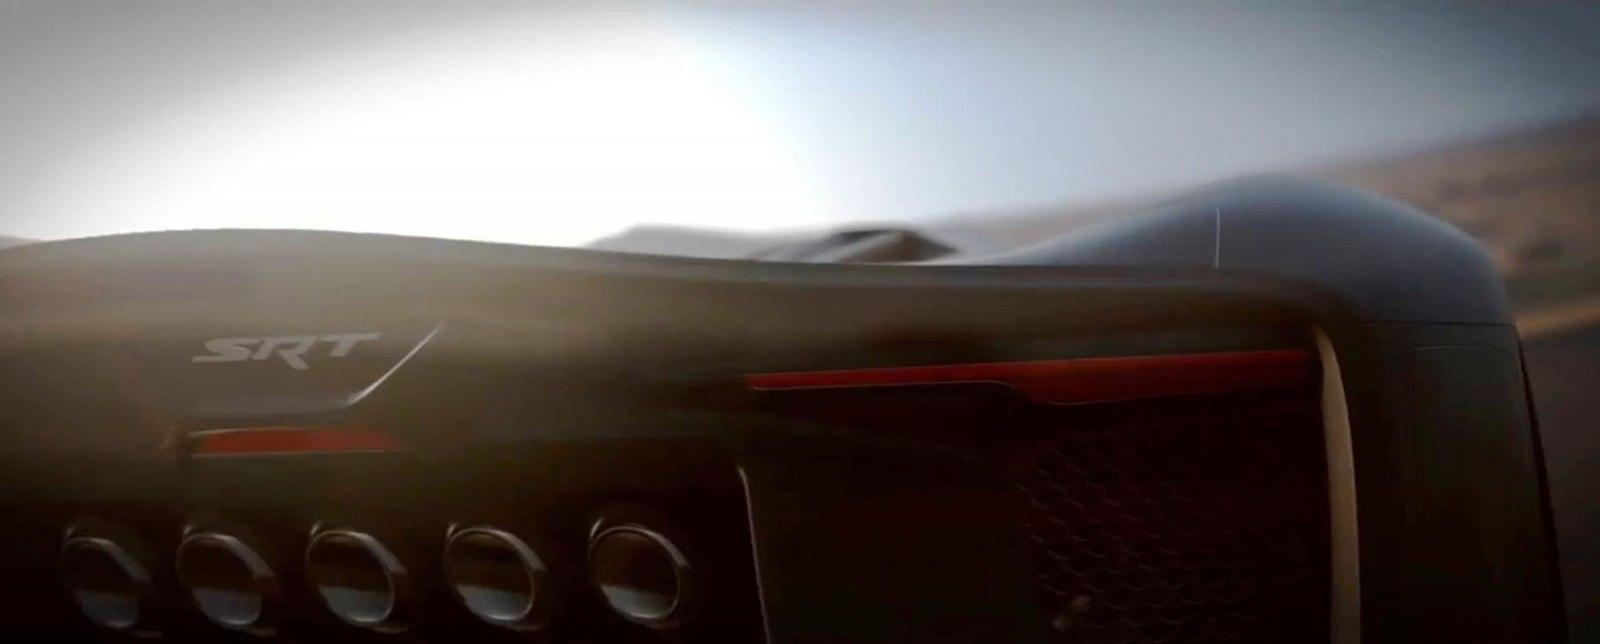 2015 SRT Tomahawk Vision Gran Turismo 4